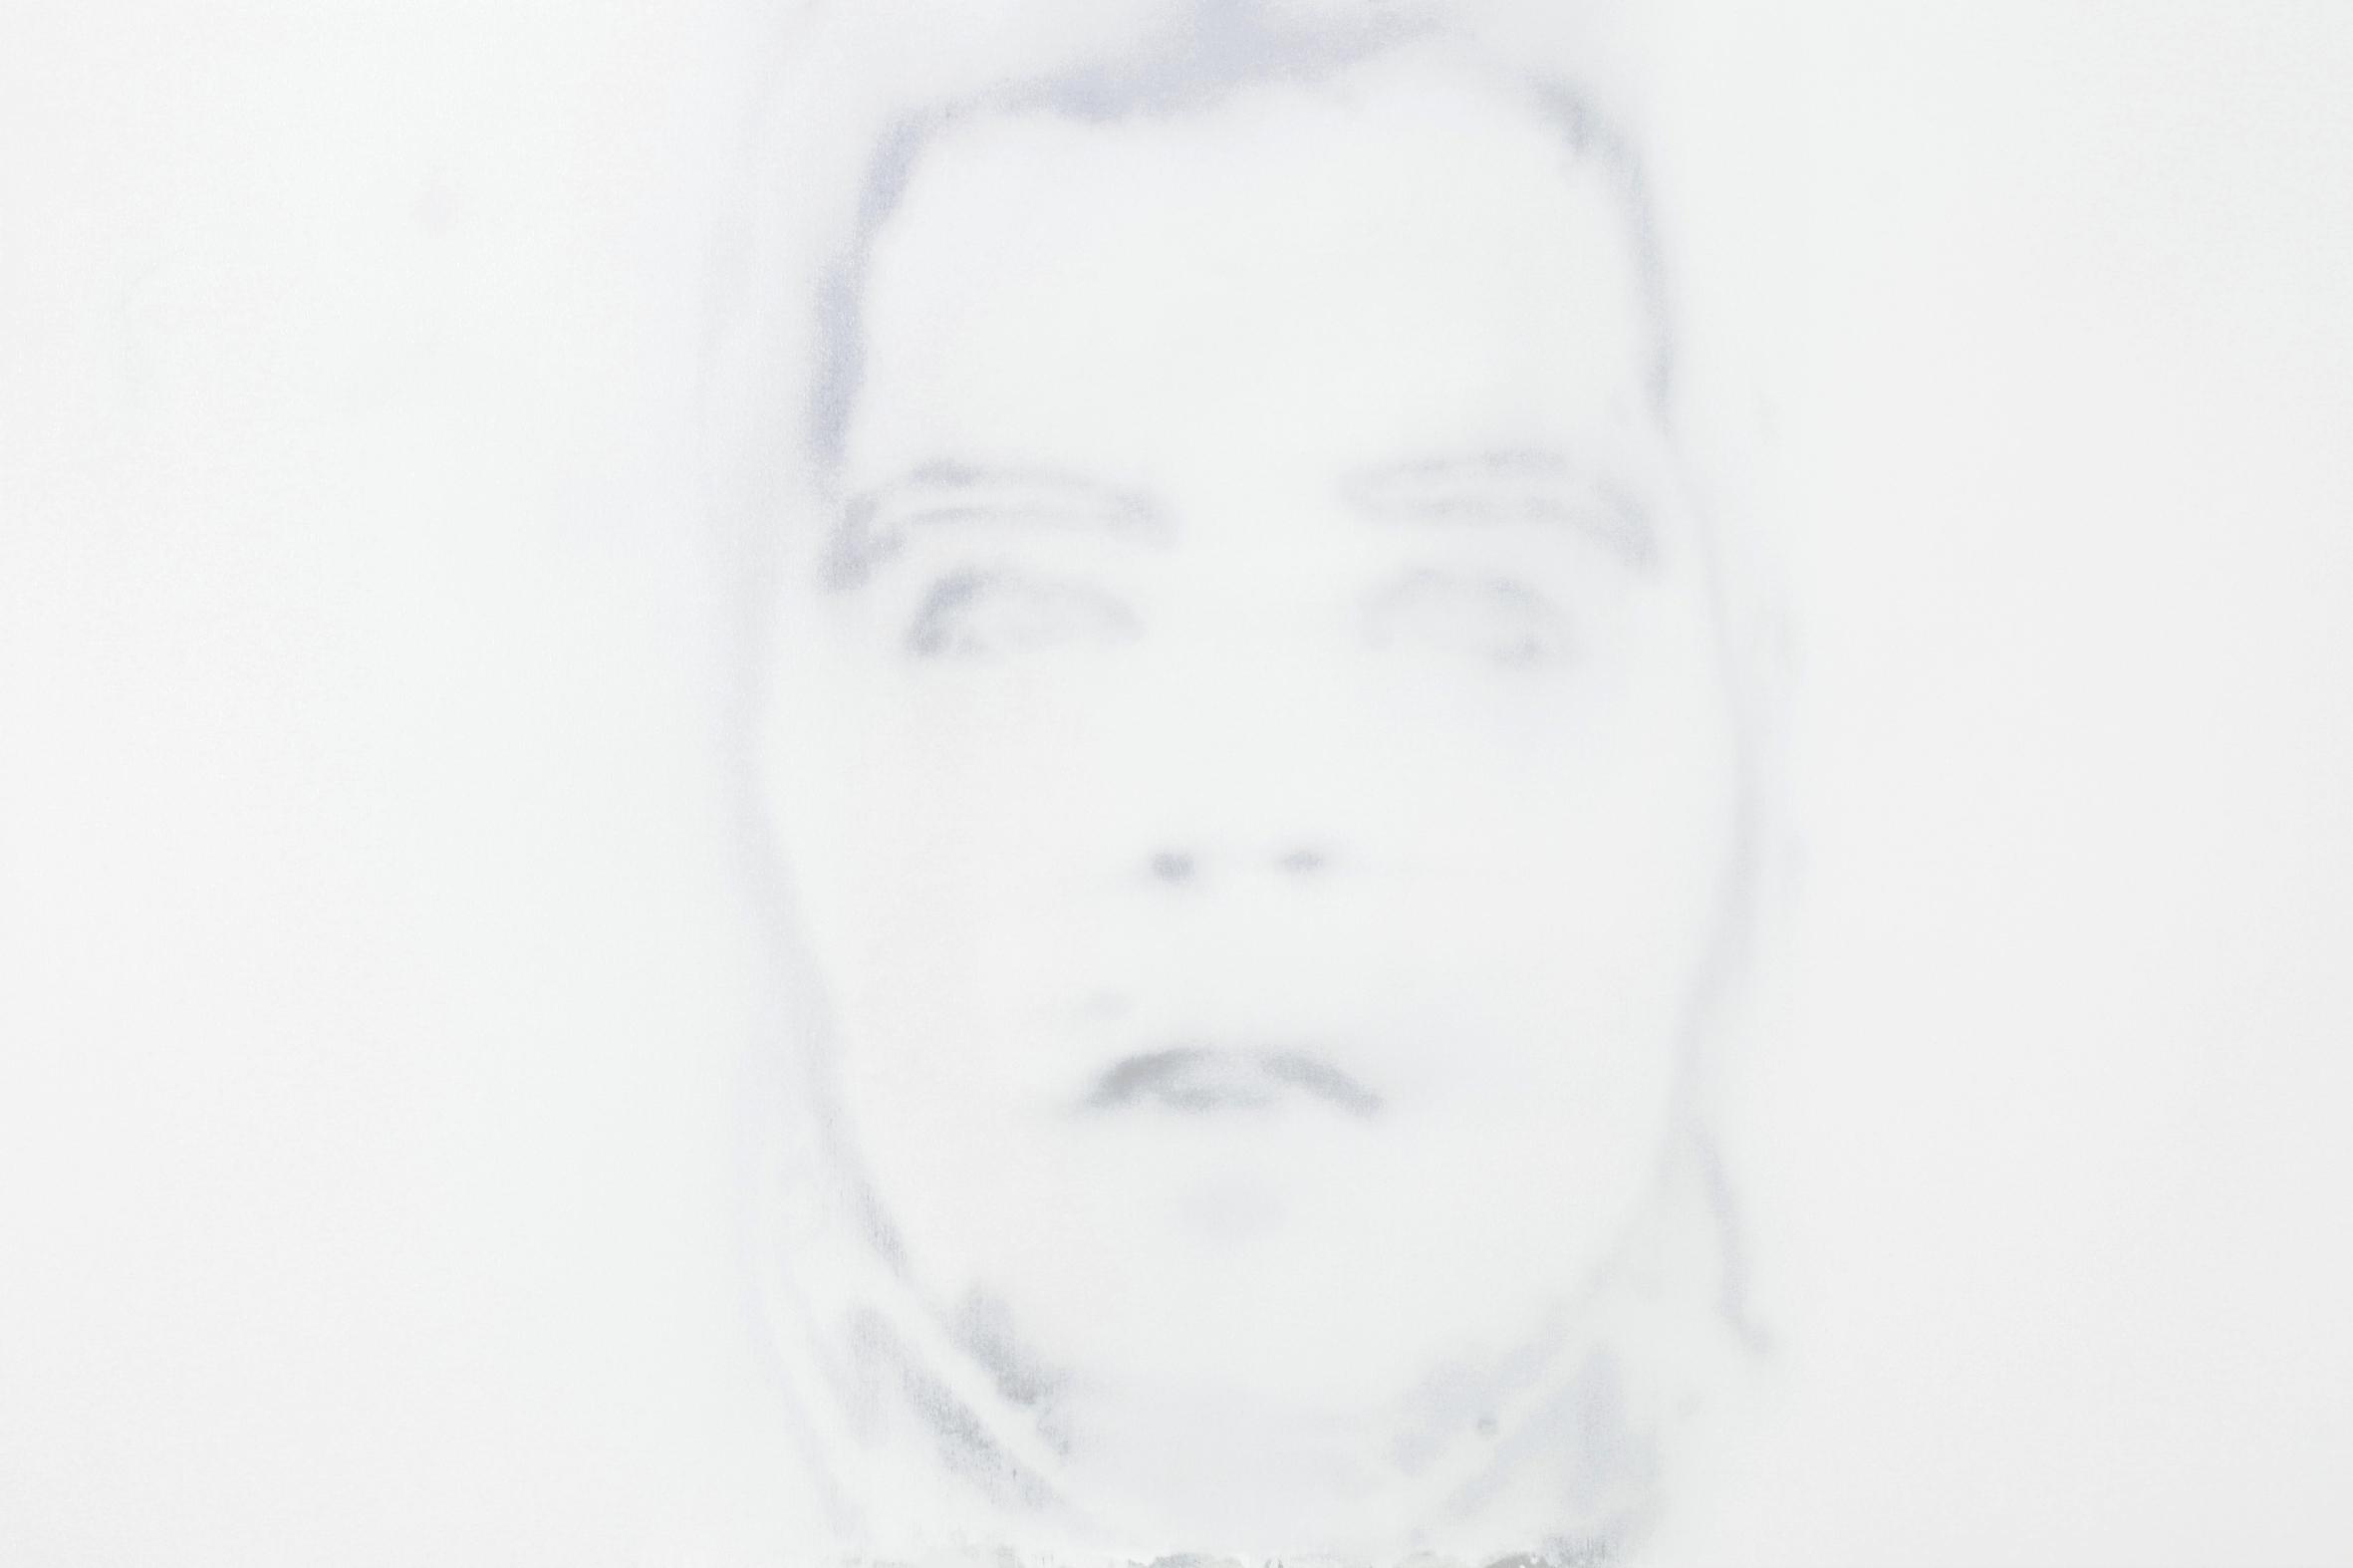 Kopie von I.E.B 2017 Öl-Leinwand 100 x 150 cm